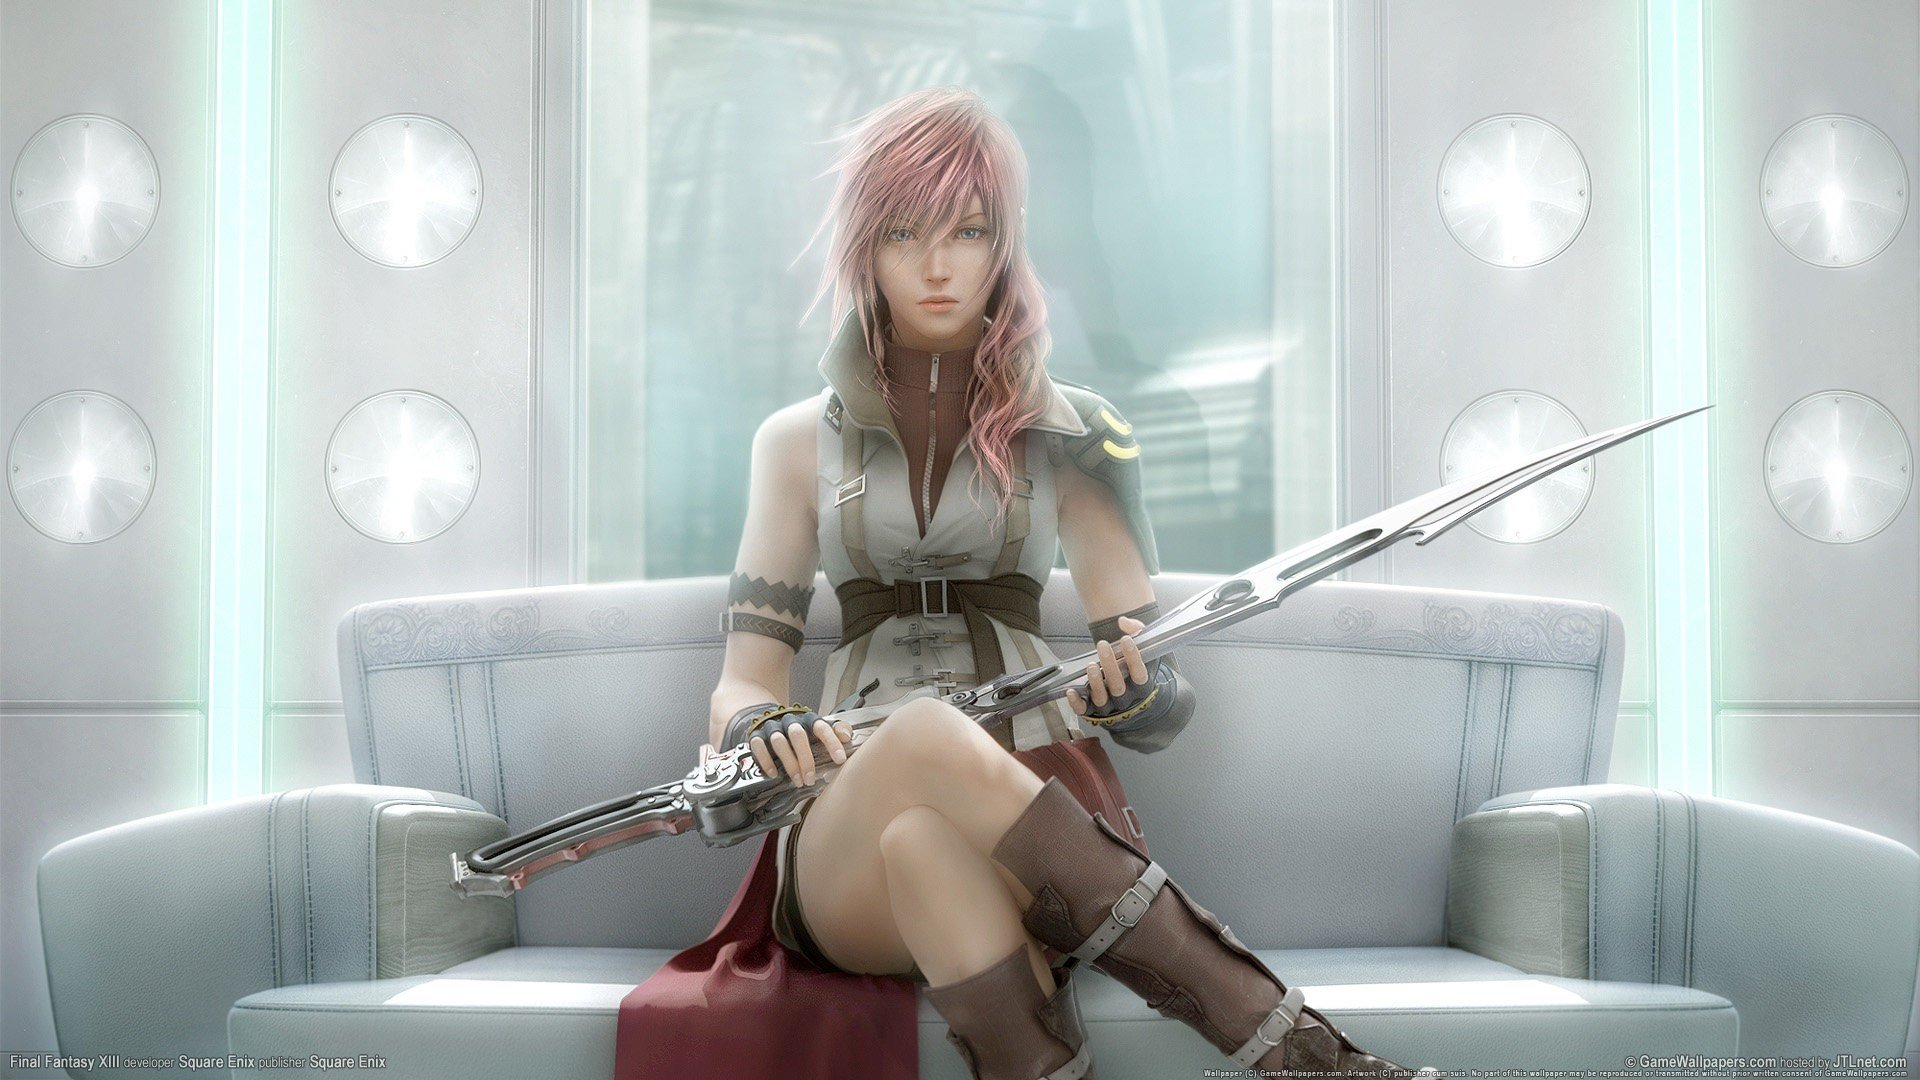 Final Fantasy Xiv Claire Farron Hd Wallpapers Desktop And